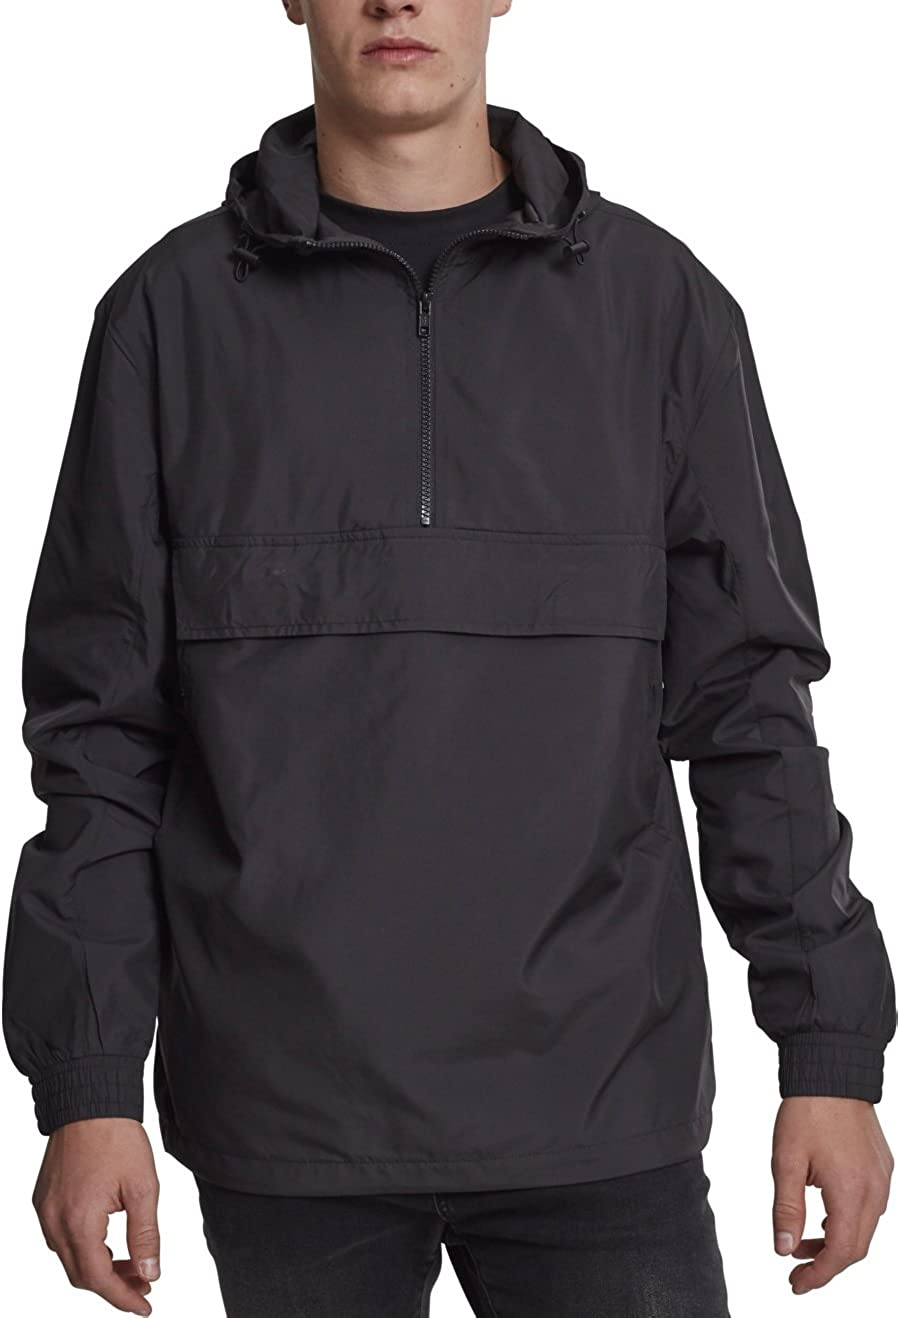 Urban Free Shipping Cheap Bargain Gift Classics - Basic Jacket Pull-Over unisex Windbreaker Black